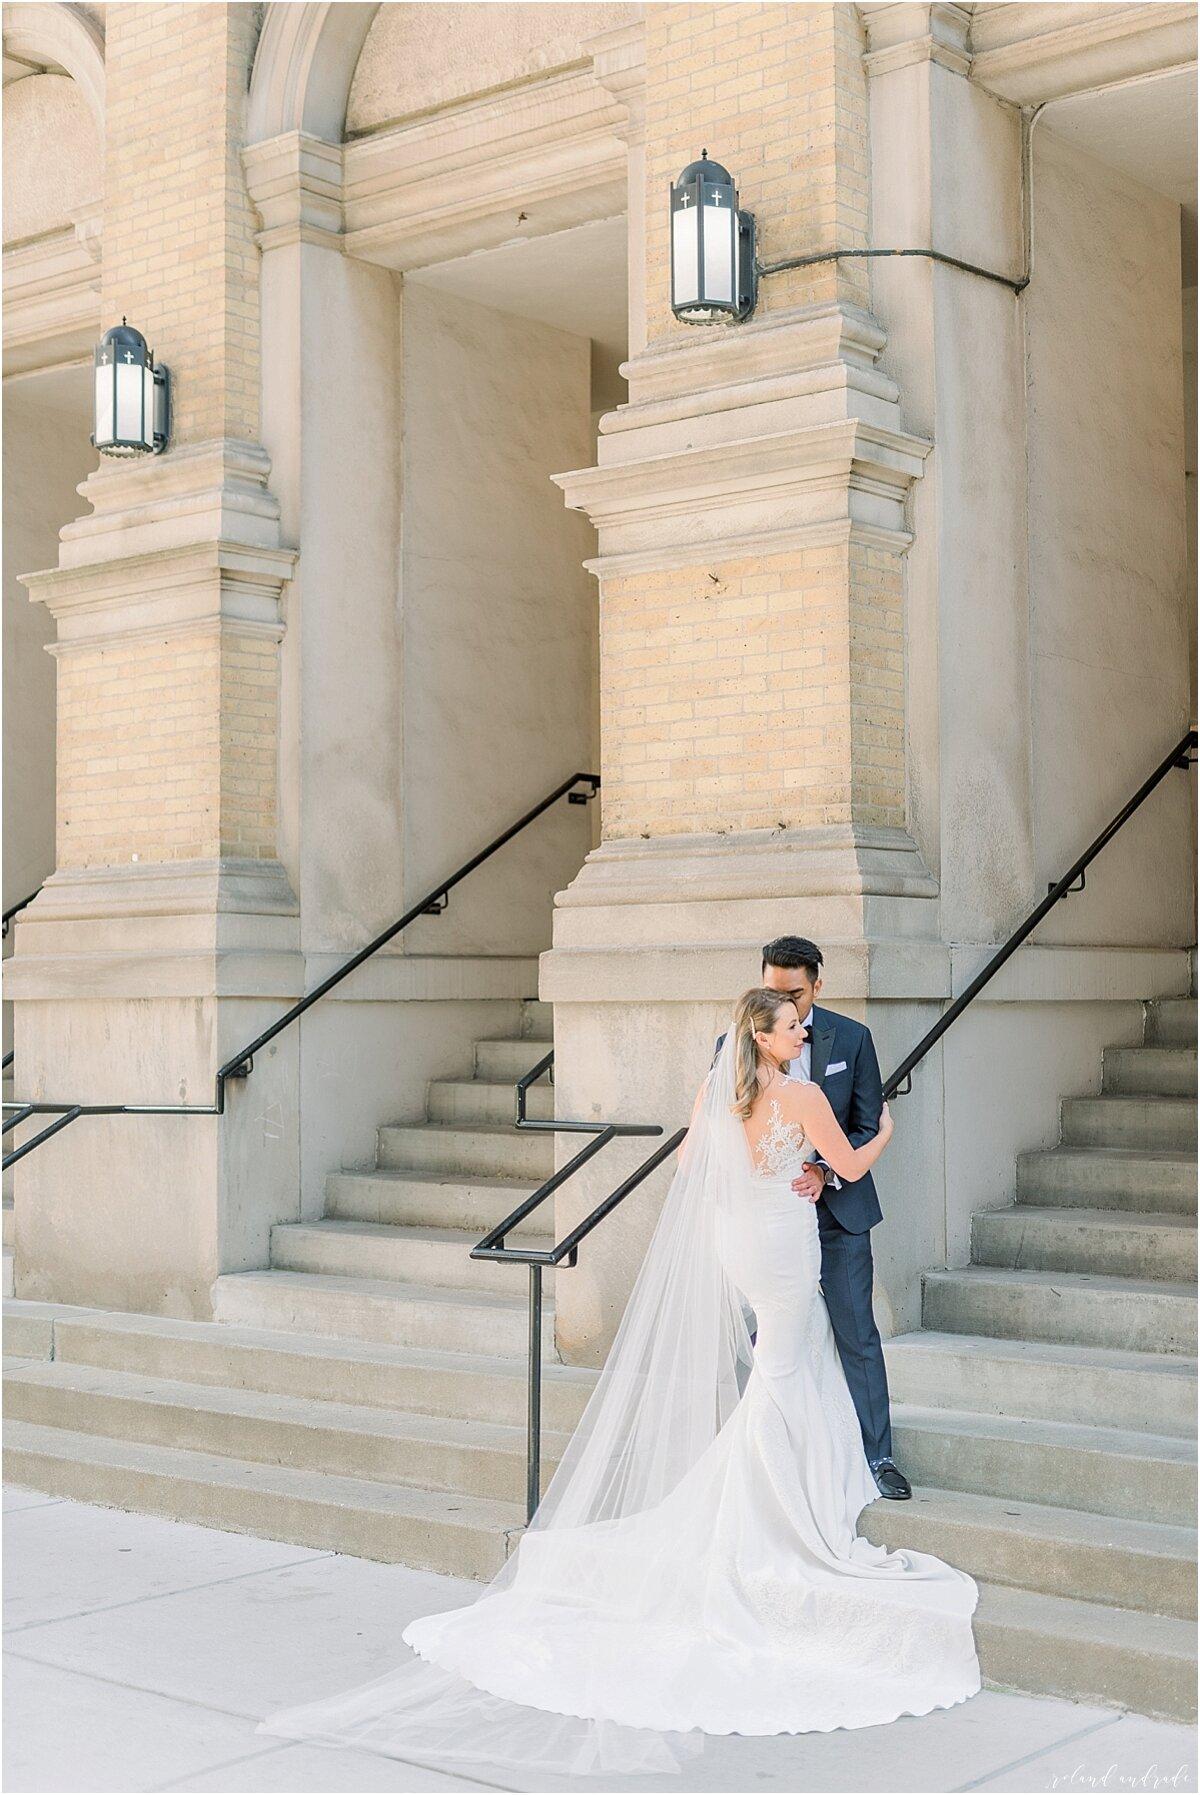 River Roast Wedding + Light and Airy Wedding Photographer Chicago + renaissance Hotel Wedding Photographer + Chicago Photography + Naperville Wedding Photographer + Chicago Engagement Photographer + Best Photographer In Chicago_0042.jpg